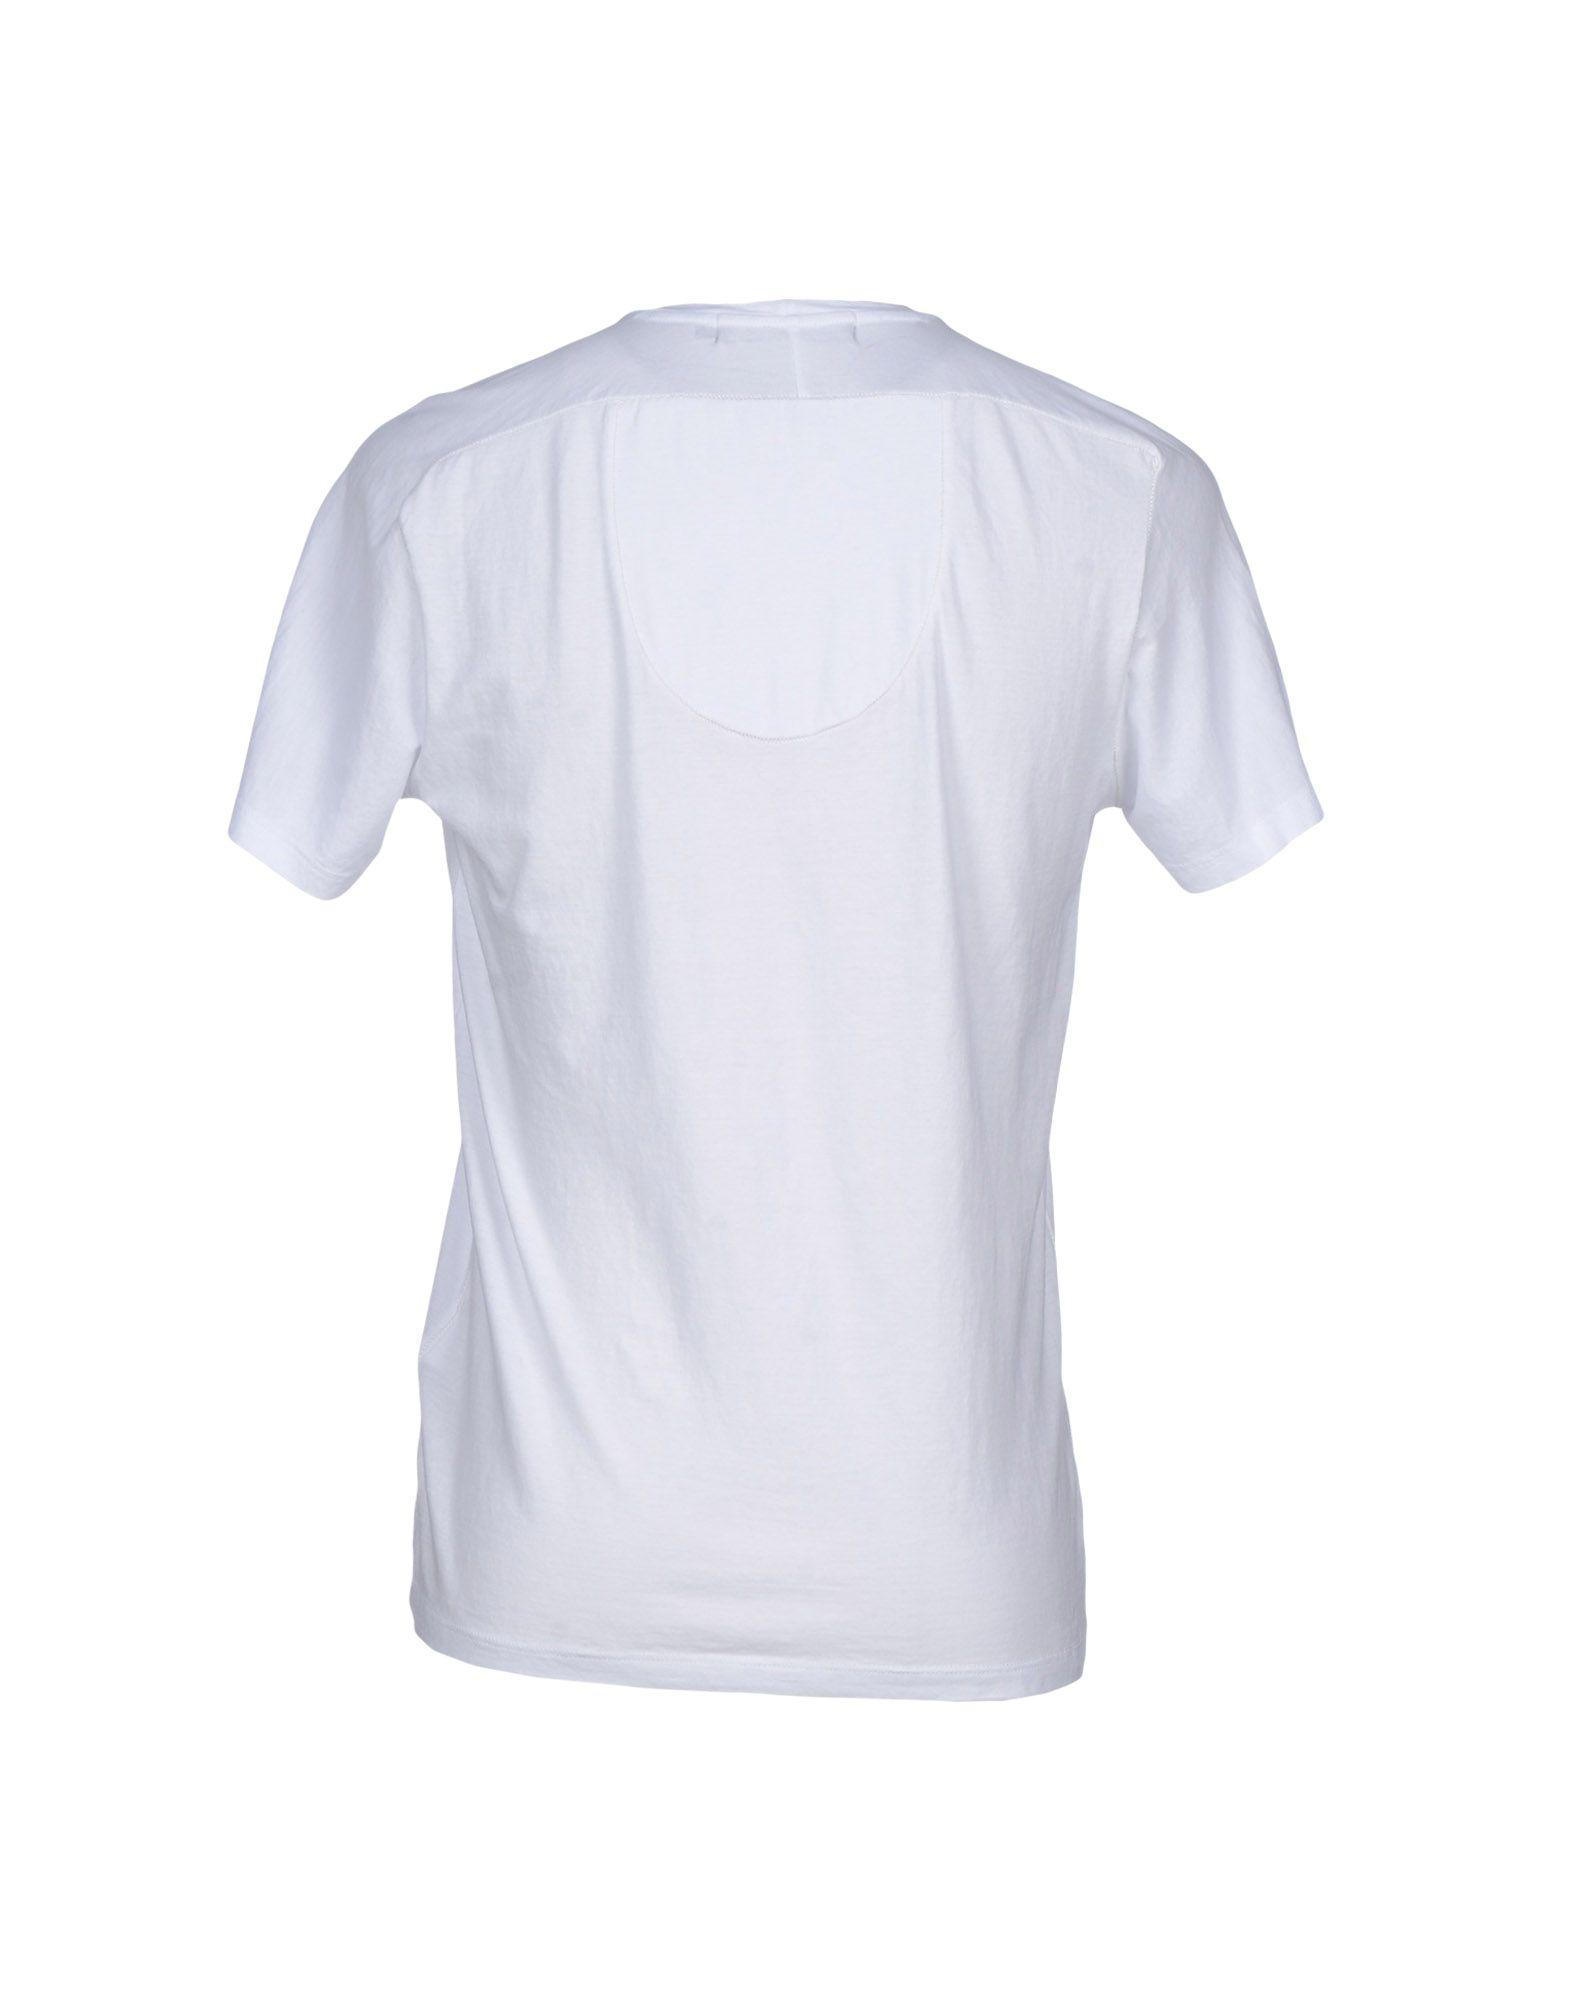 T-Shirt Tom Rebl Rebl Tom Uomo - 37821525PK b0cd7d